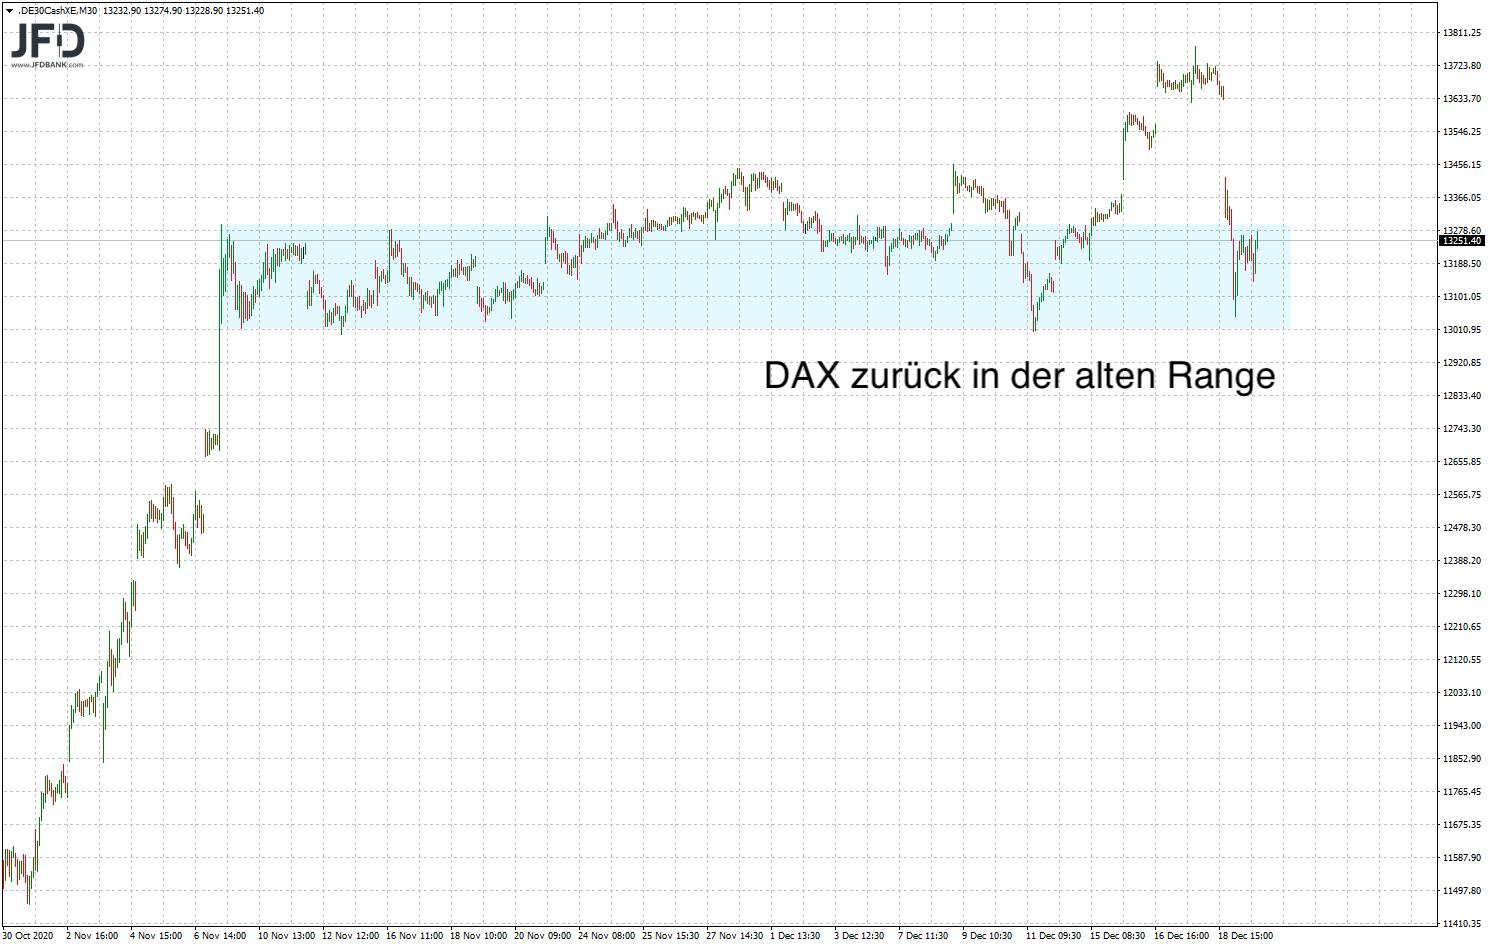 20201222_dax_xetra_range.png